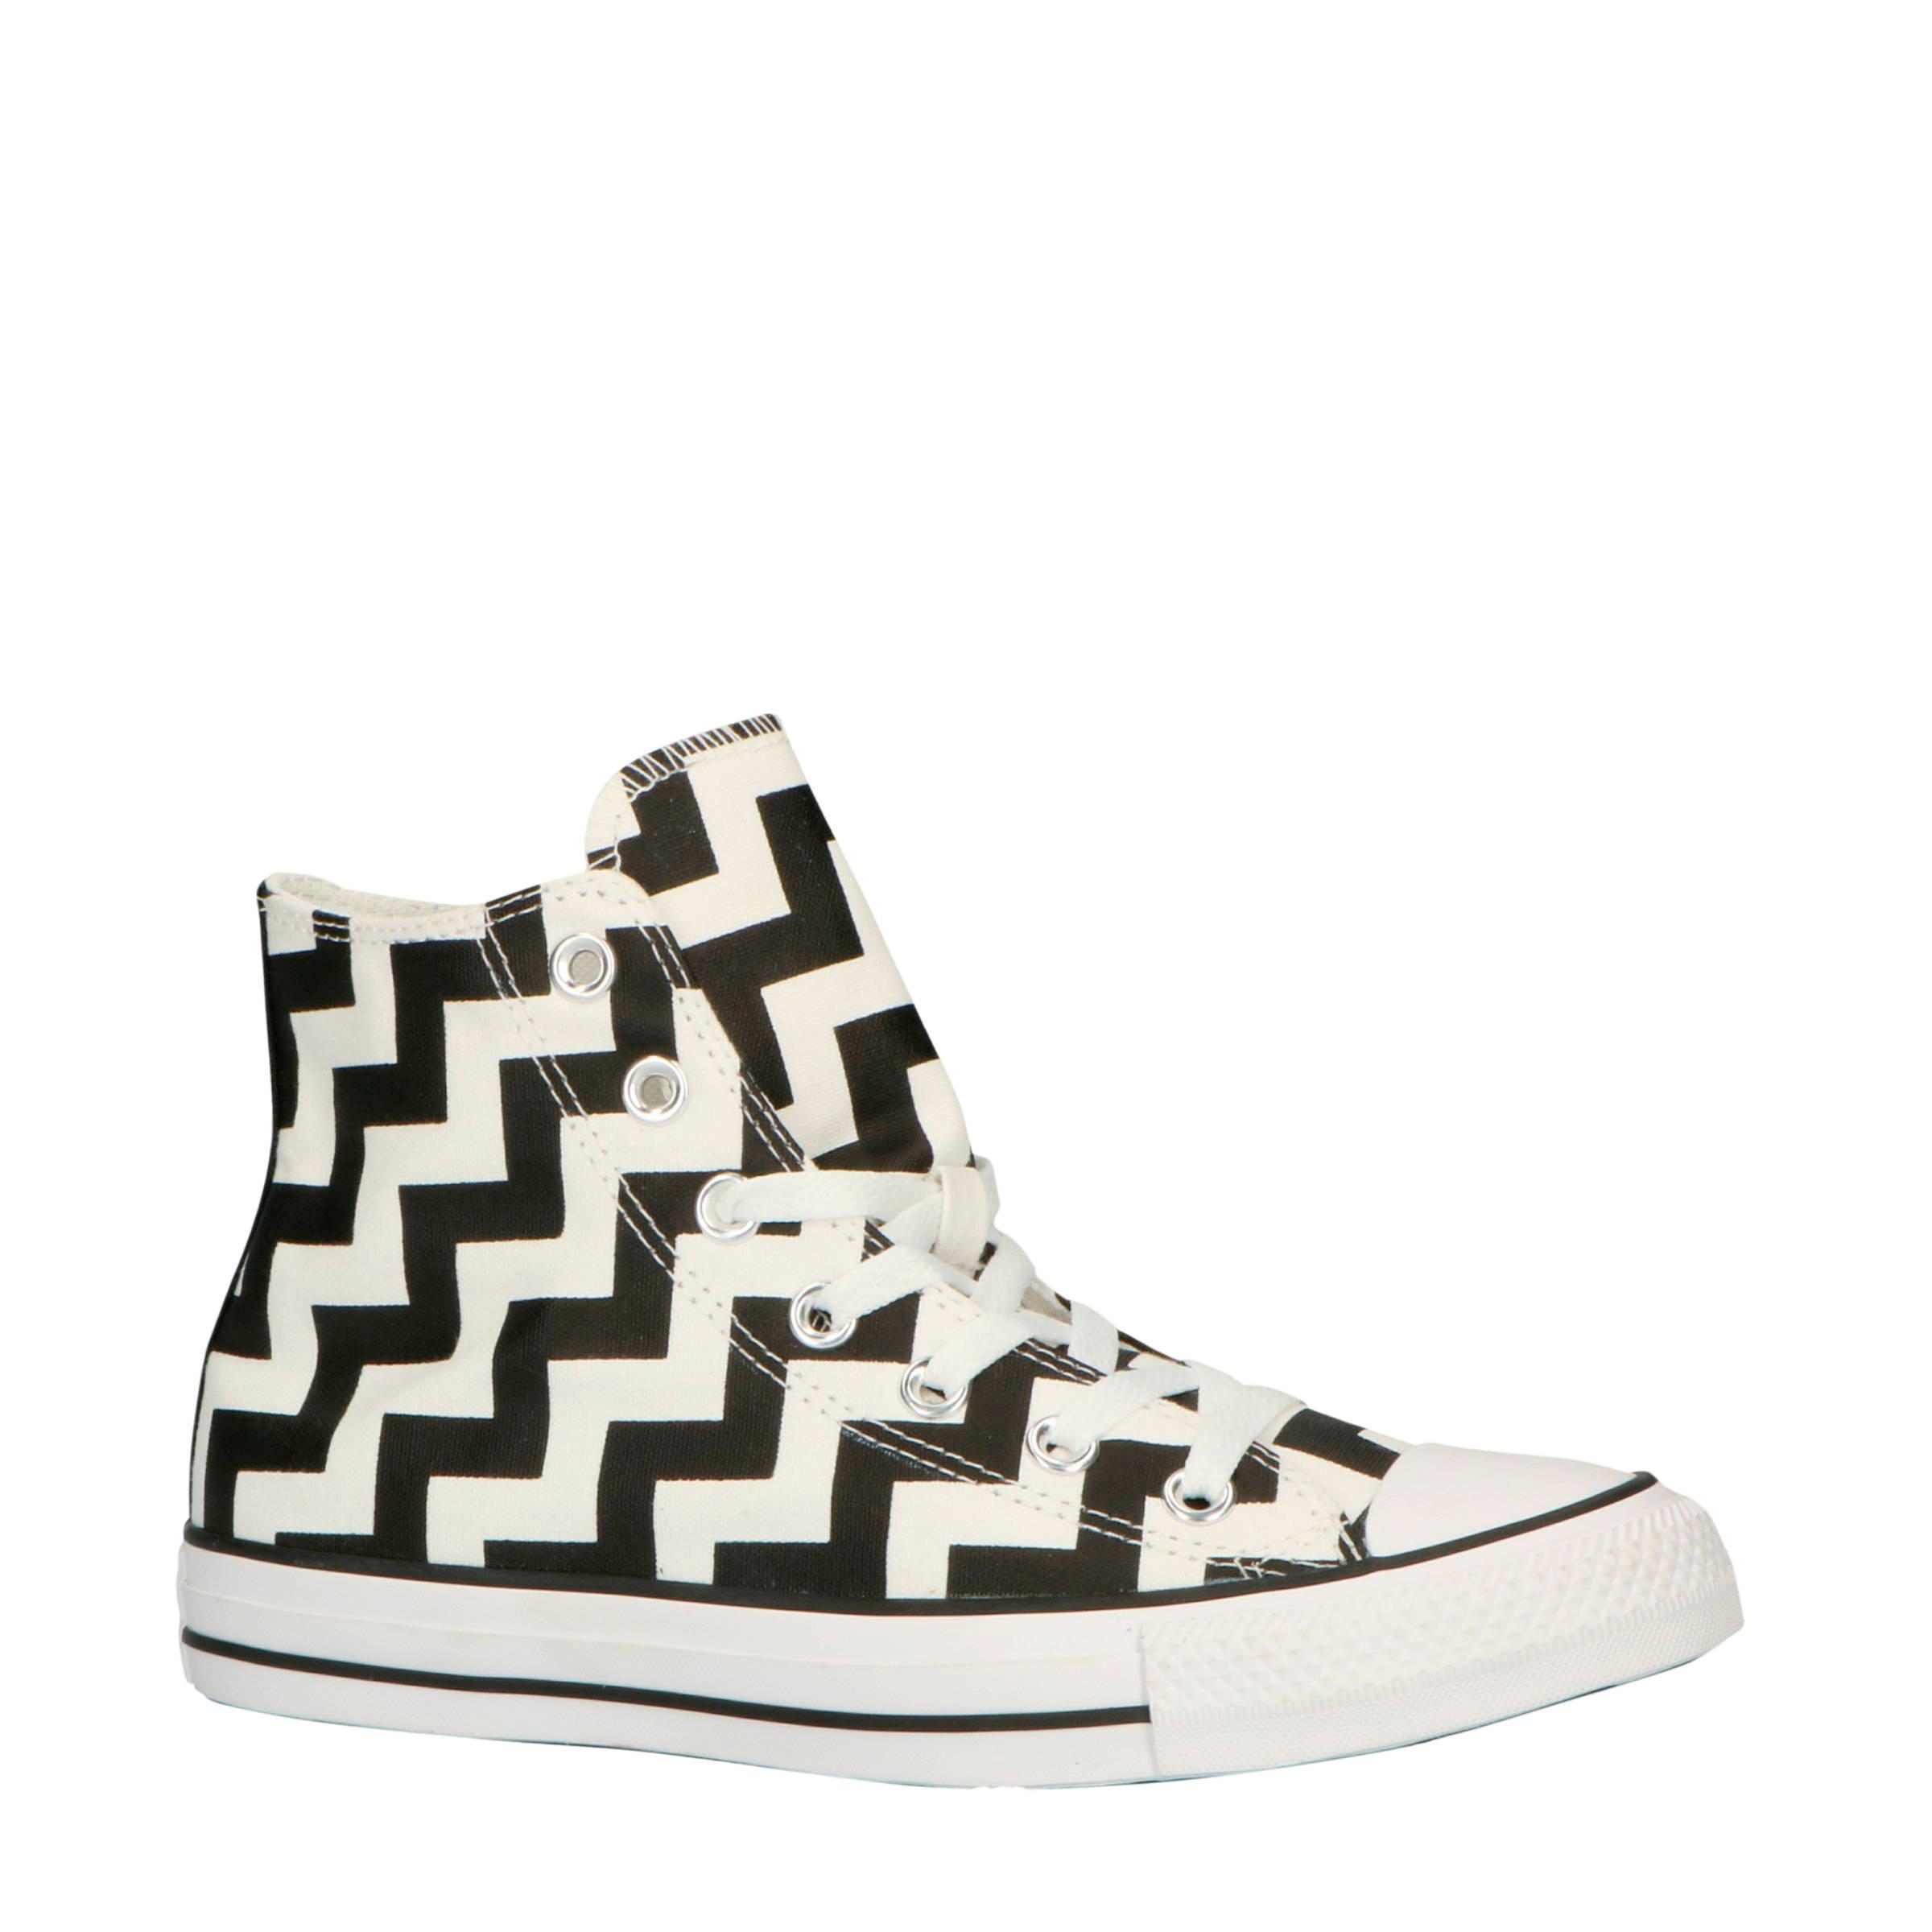 Converse Chuck Taylor All Star Hi sneakers zwartwit | wehkamp